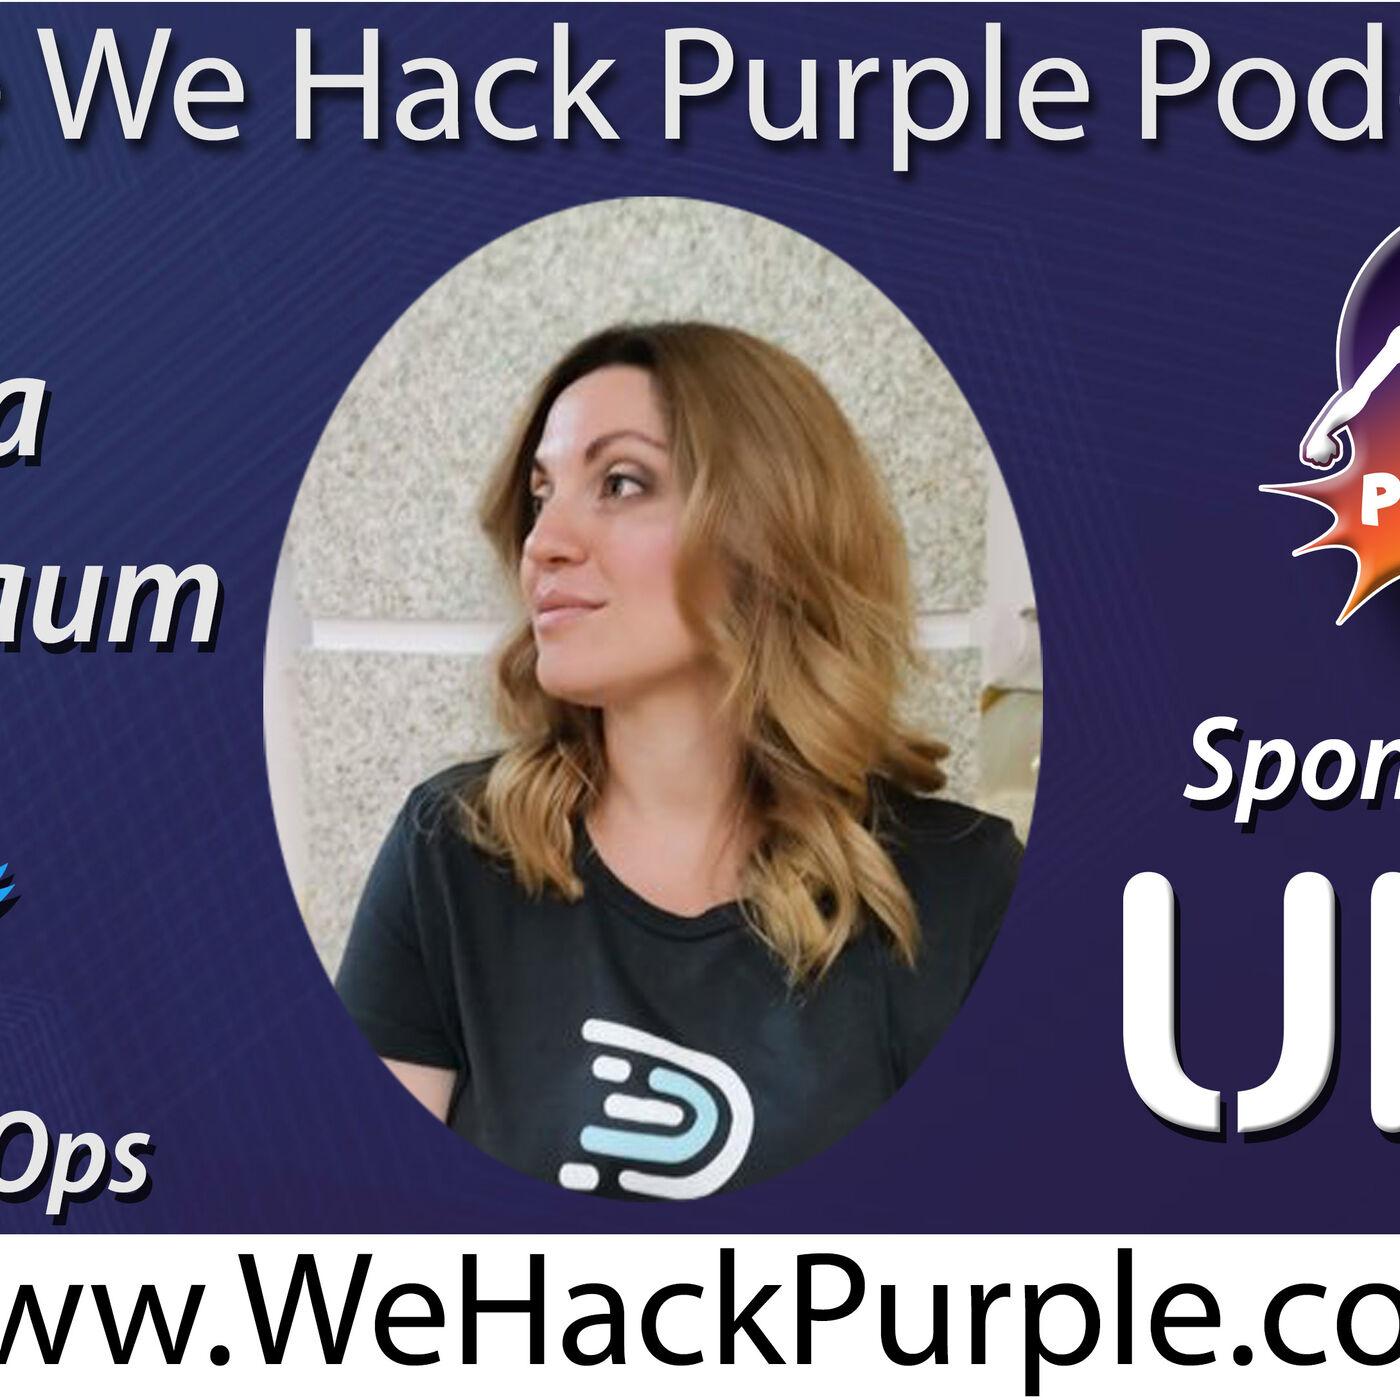 We Hack Purple Podcast 21 with Guest Sasha Rosenbaum